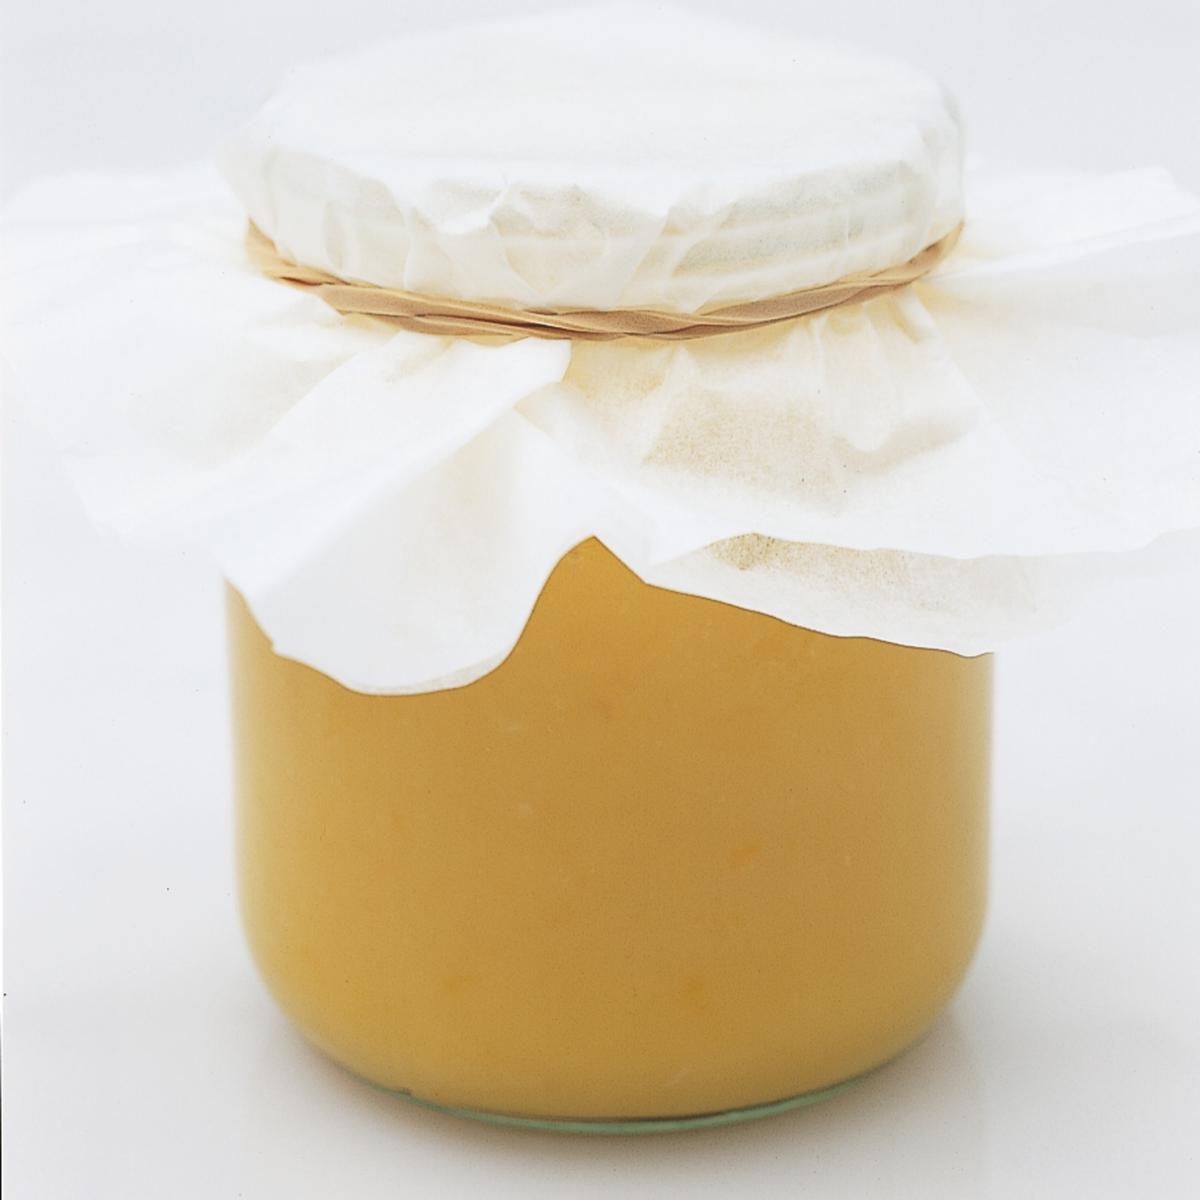 A picture of Delia's Lemon Curd recipe